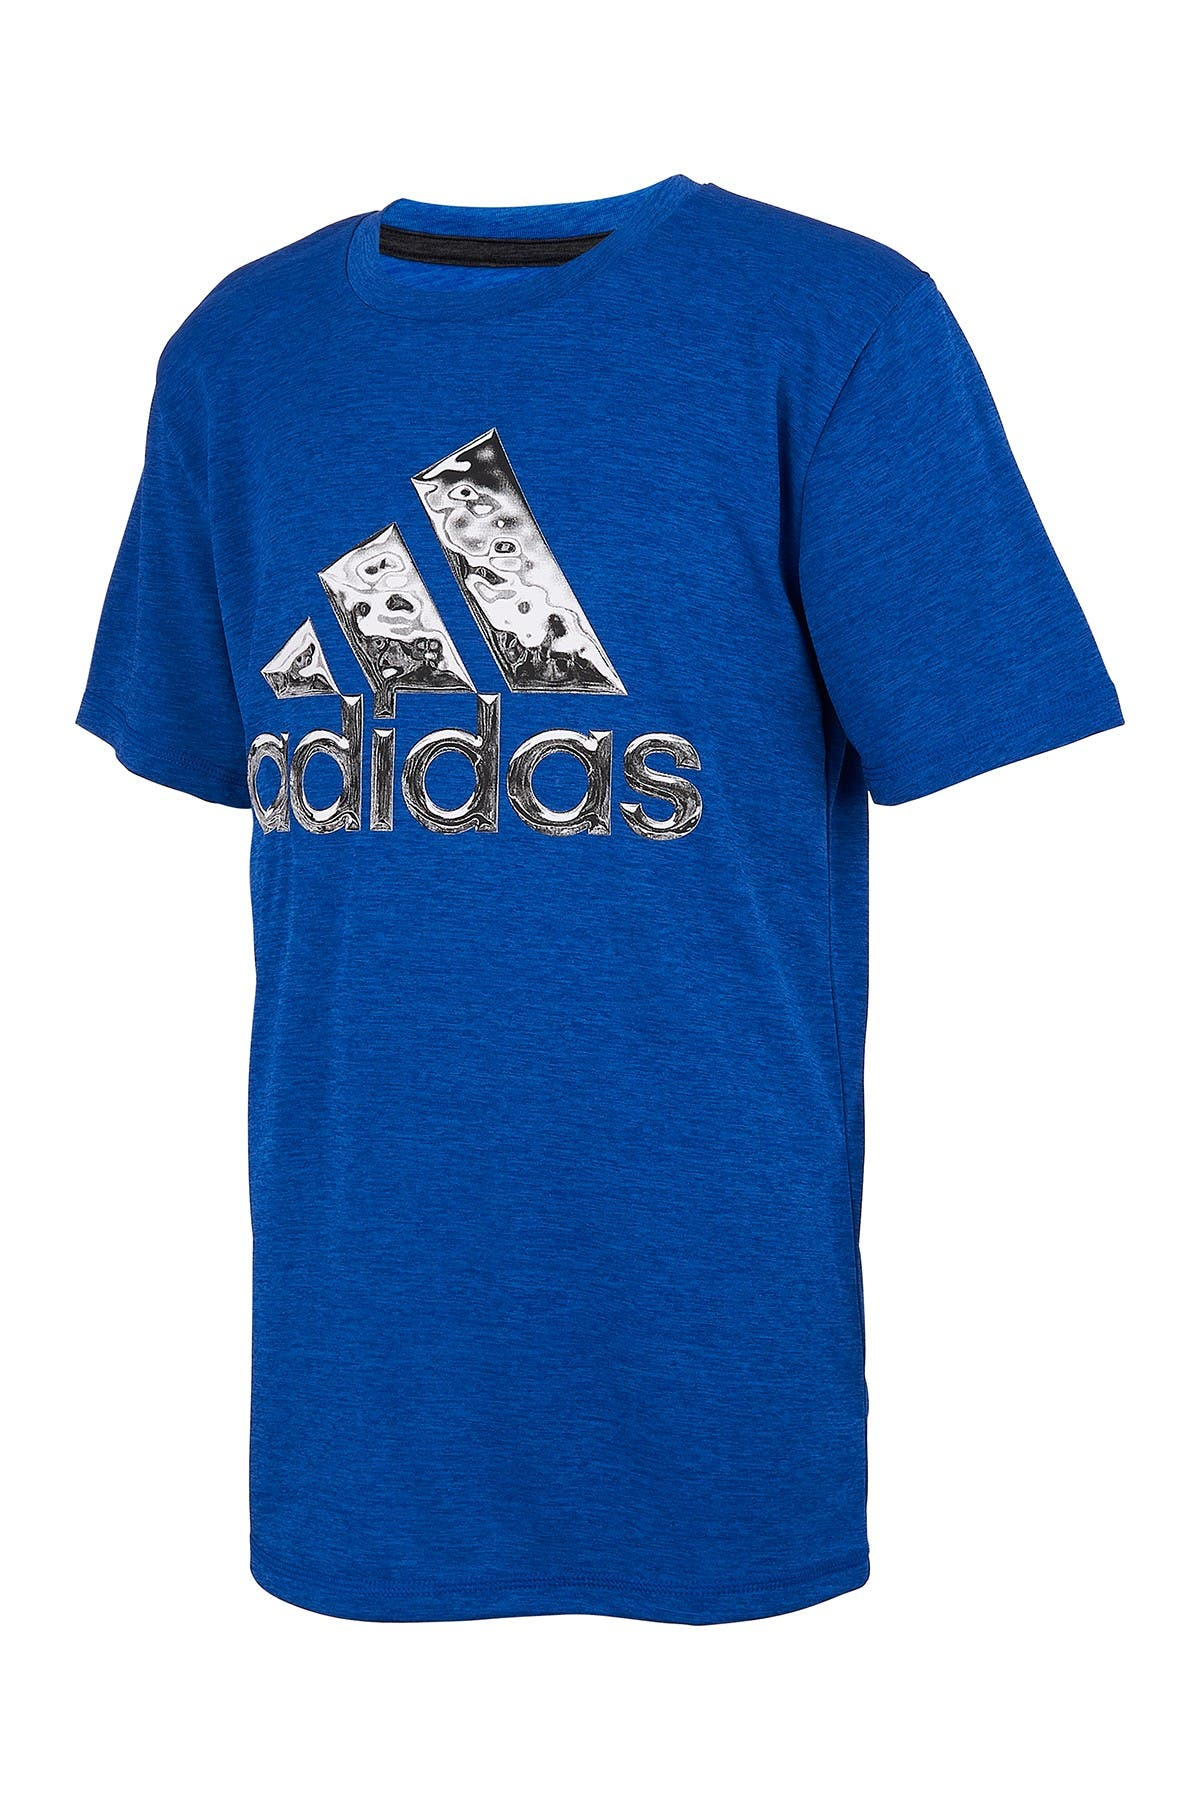 Image of adidas Liquid Metal Graphic T-Shirt